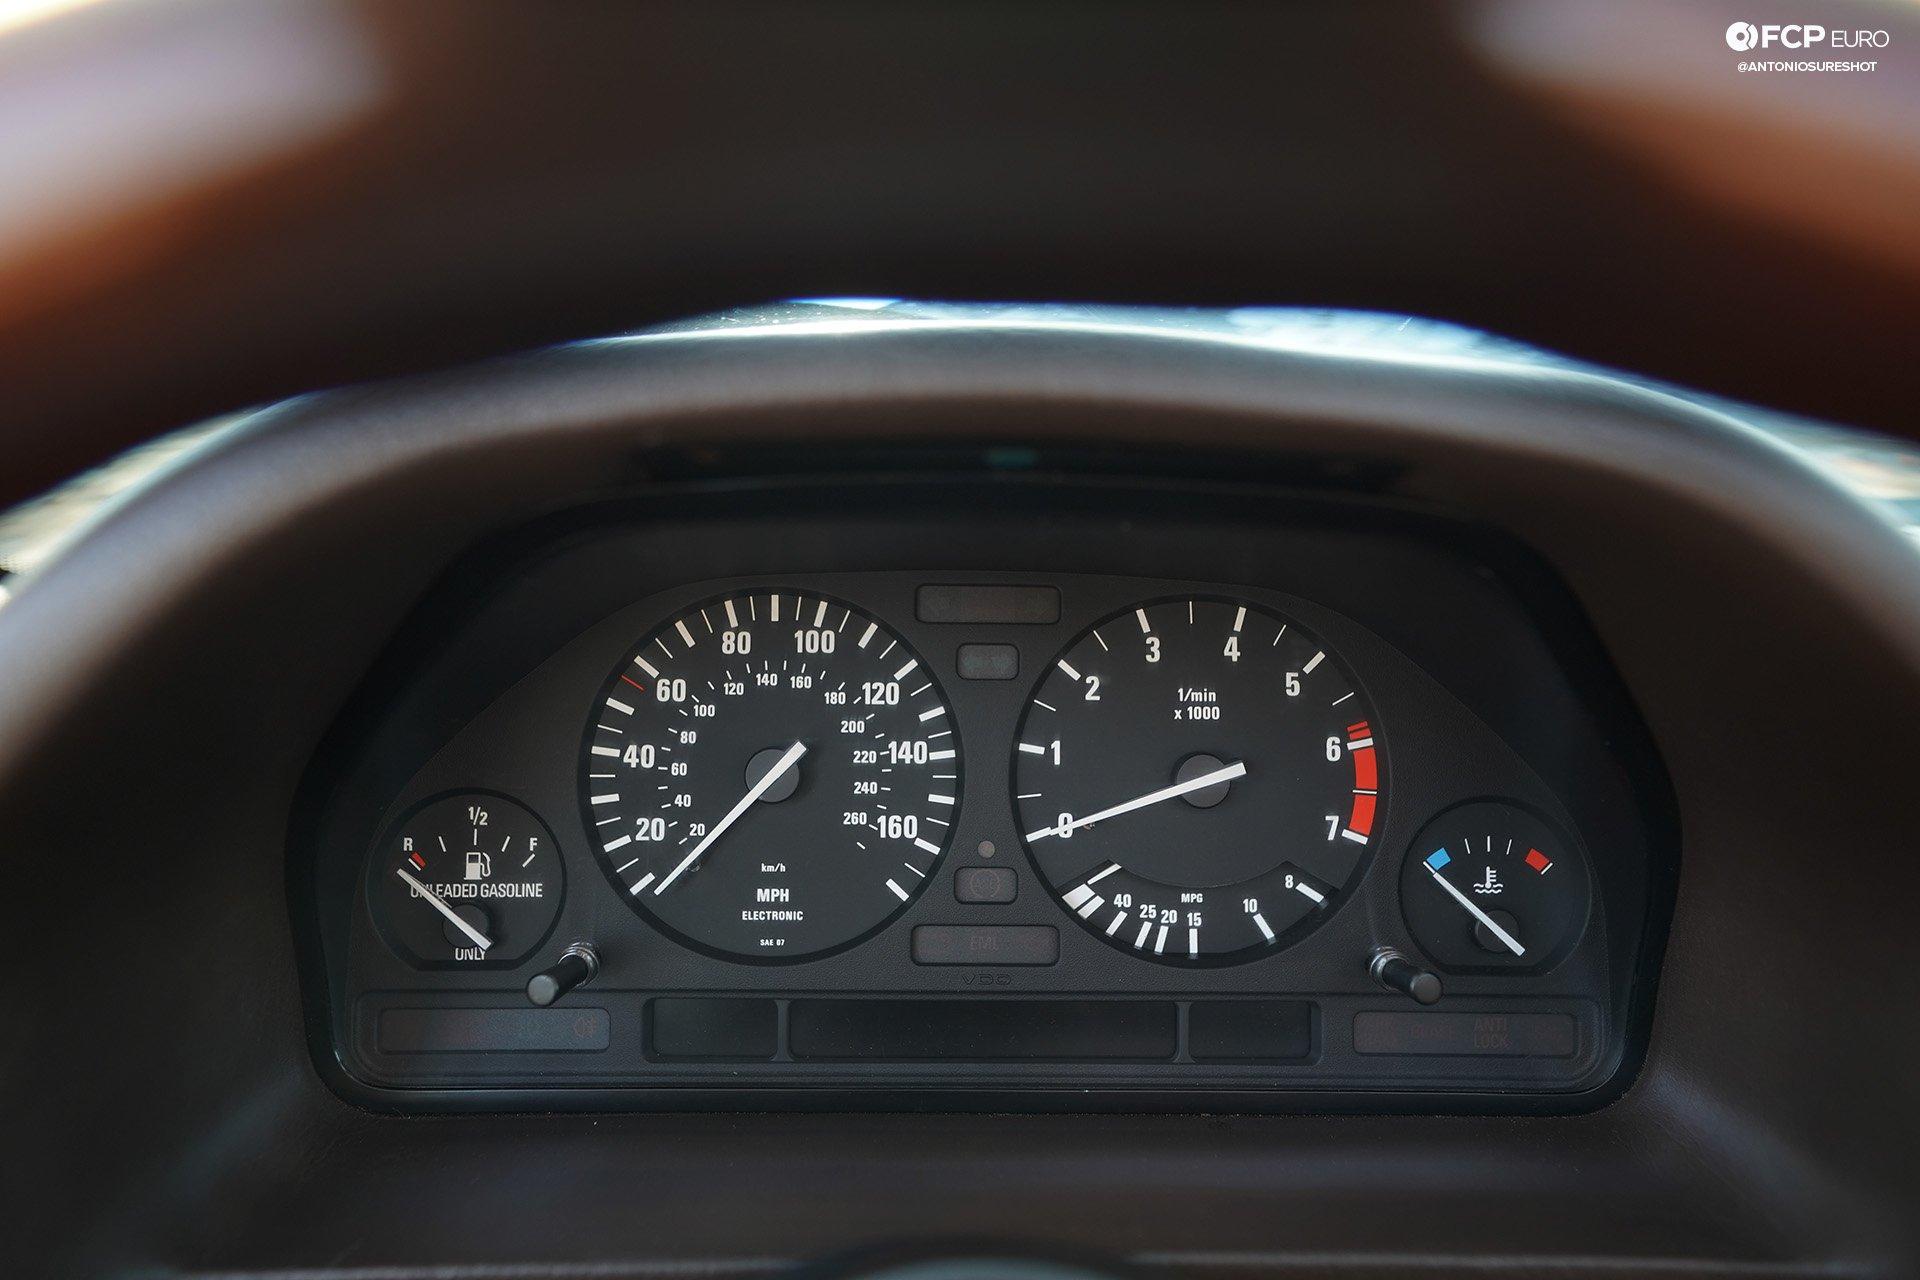 BMW E32 750iL 6 speed A9A02531